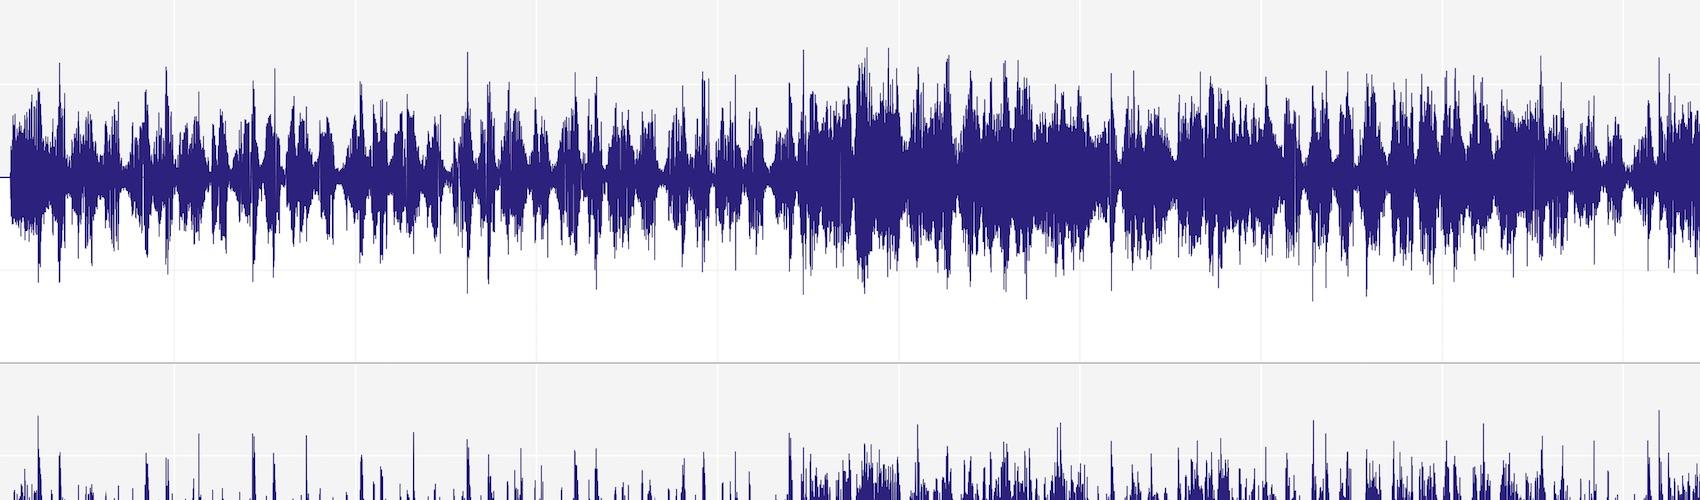 Mid/Side Decder/Encoder своими руками. Часть 1